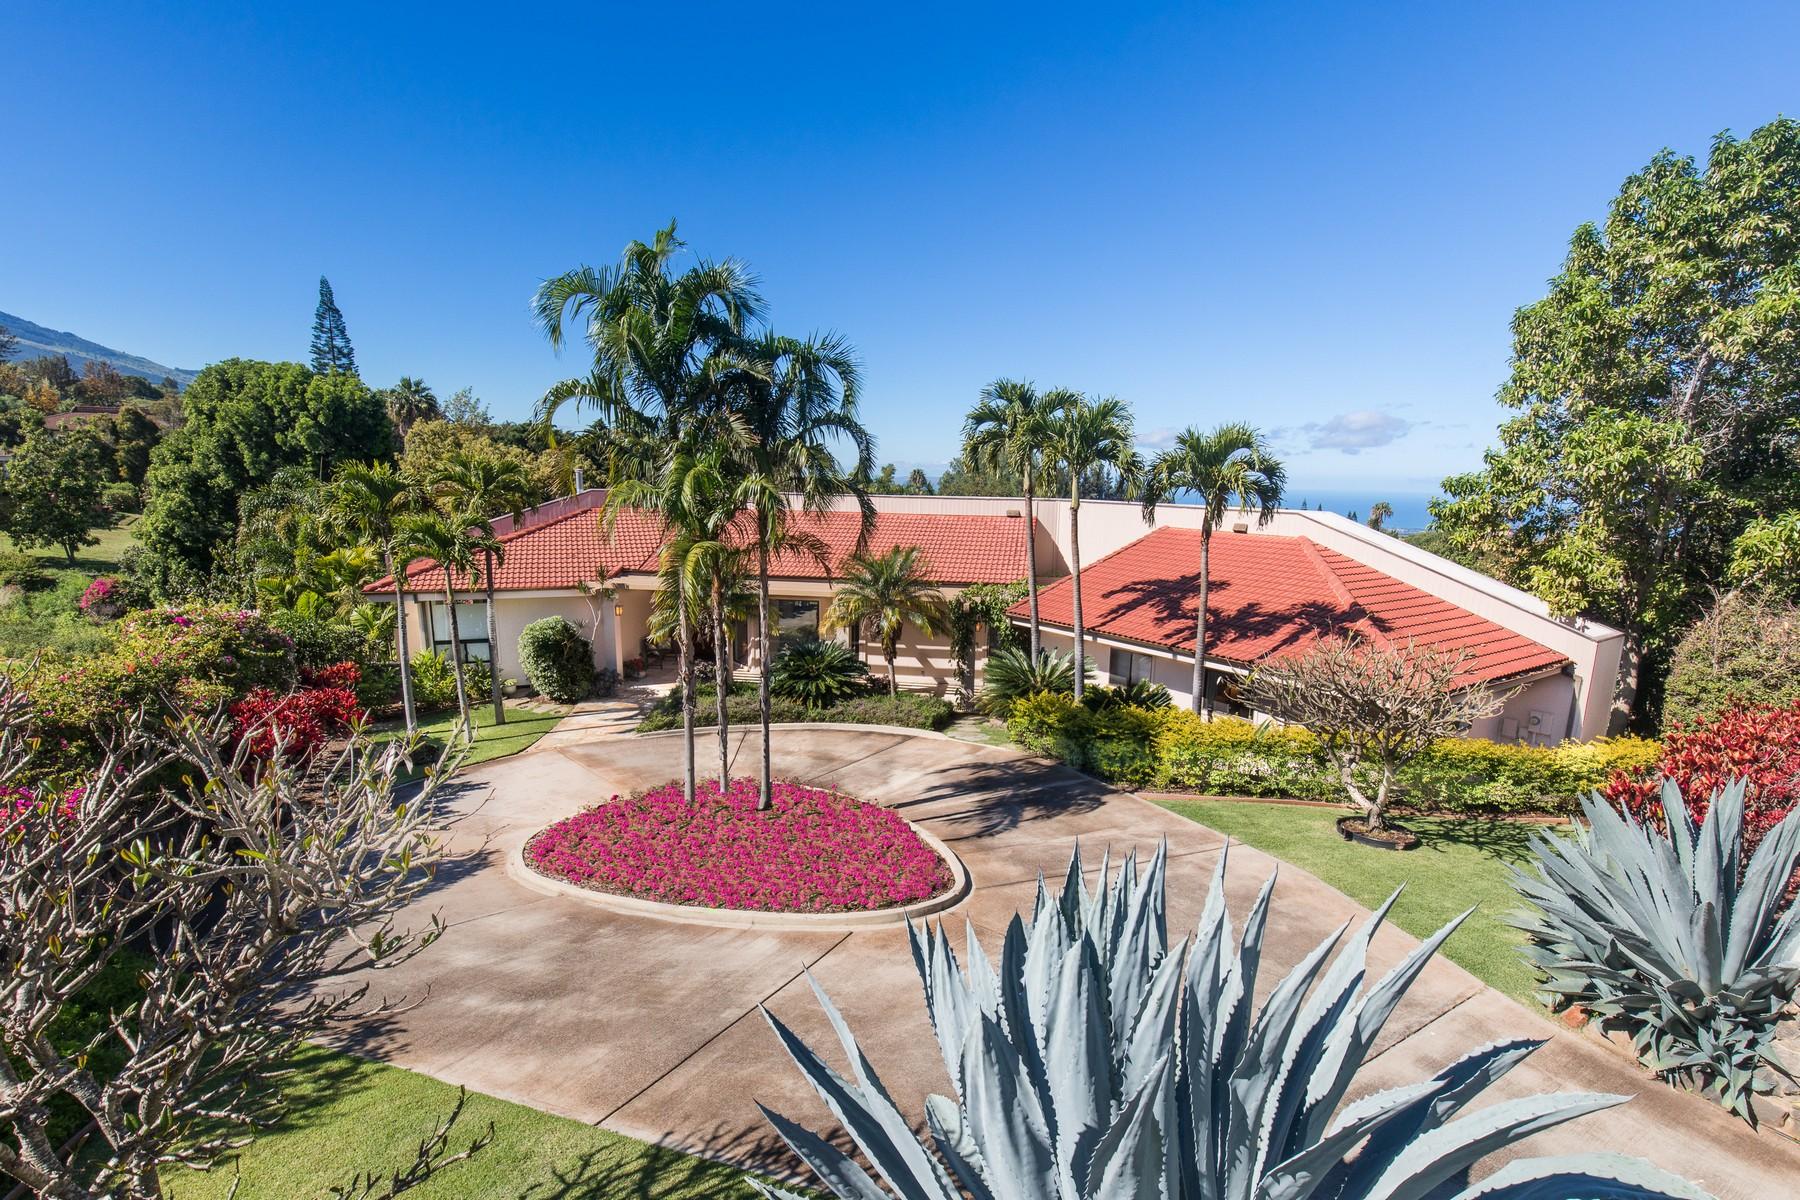 Villa per Vendita alle ore Beautiful Maui Estate, Guest House, & Pool with Ocean Views 891 Holopuni Road Kula, Hawaii, 96790 Stati Uniti